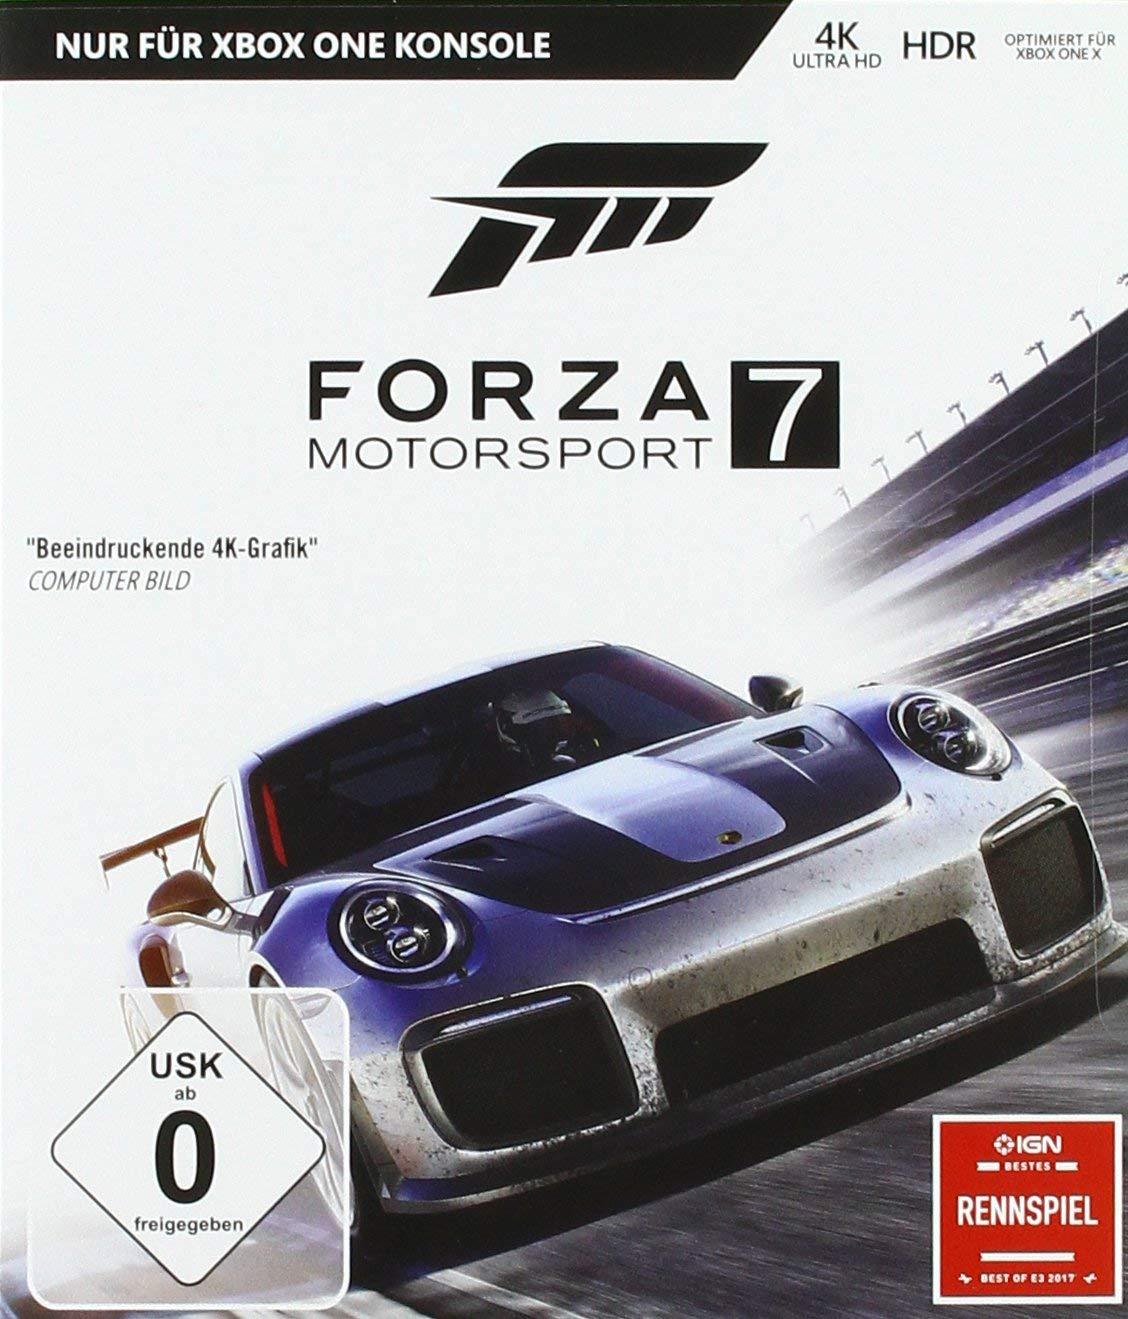 Forza Motorsport 7 - Standard Edition (Xbox One) voor €18,48 @ Amazon.de (Prime)